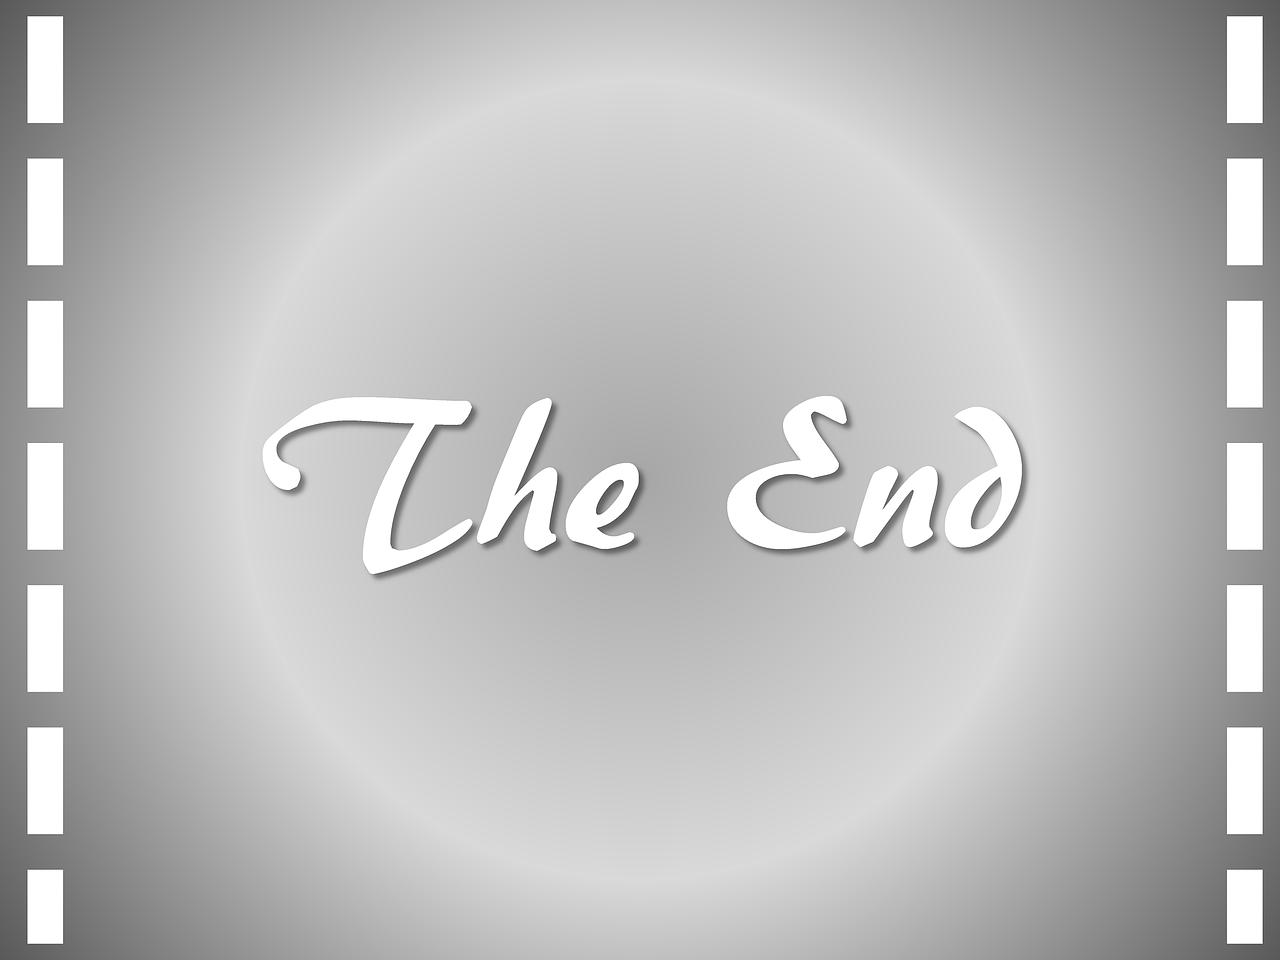 film sinema son the end